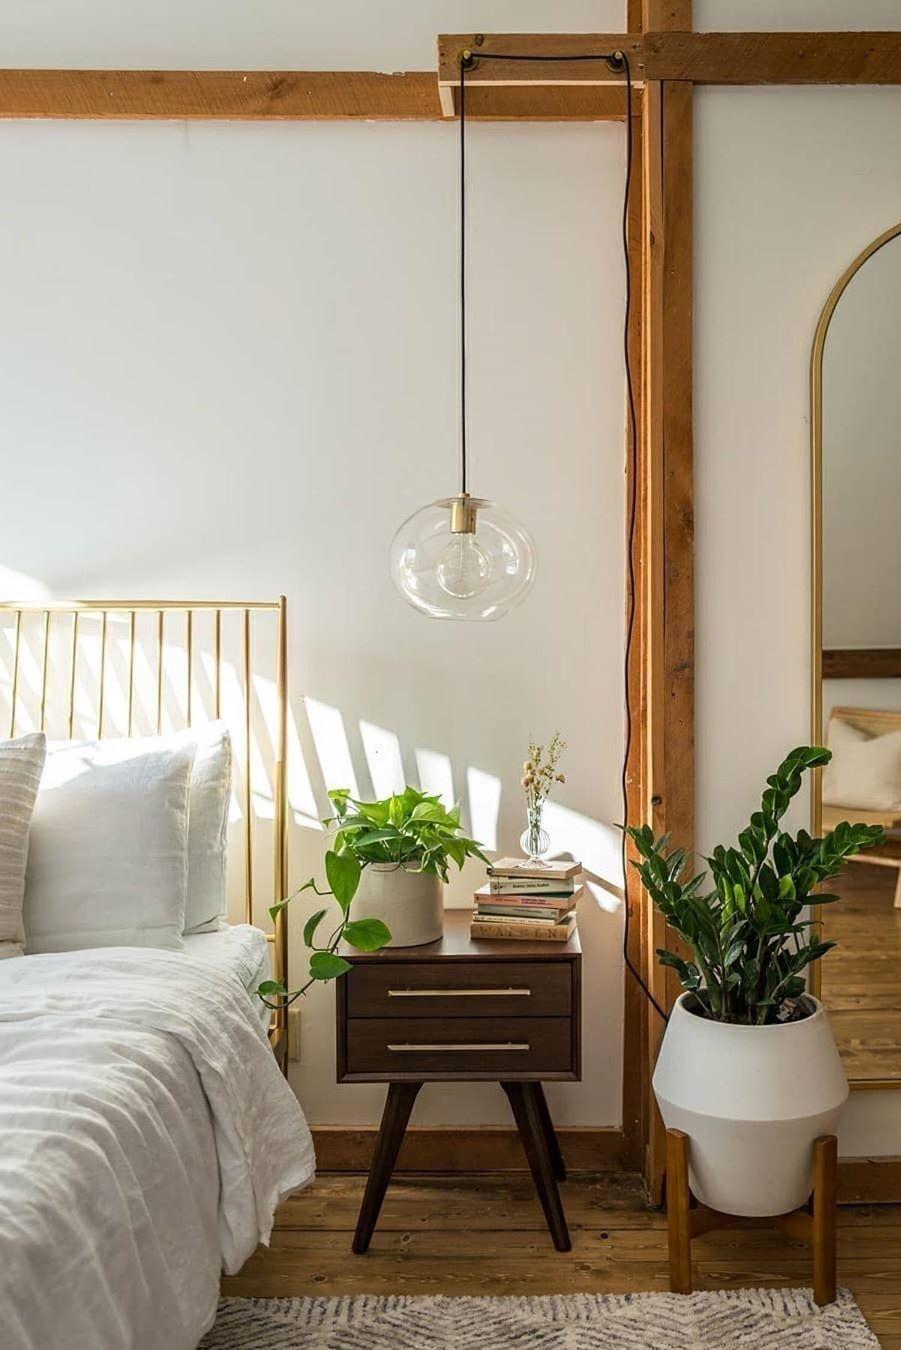 120 Bedroom Lighting Ideas In 2021 Bedroom Lighting Lightology